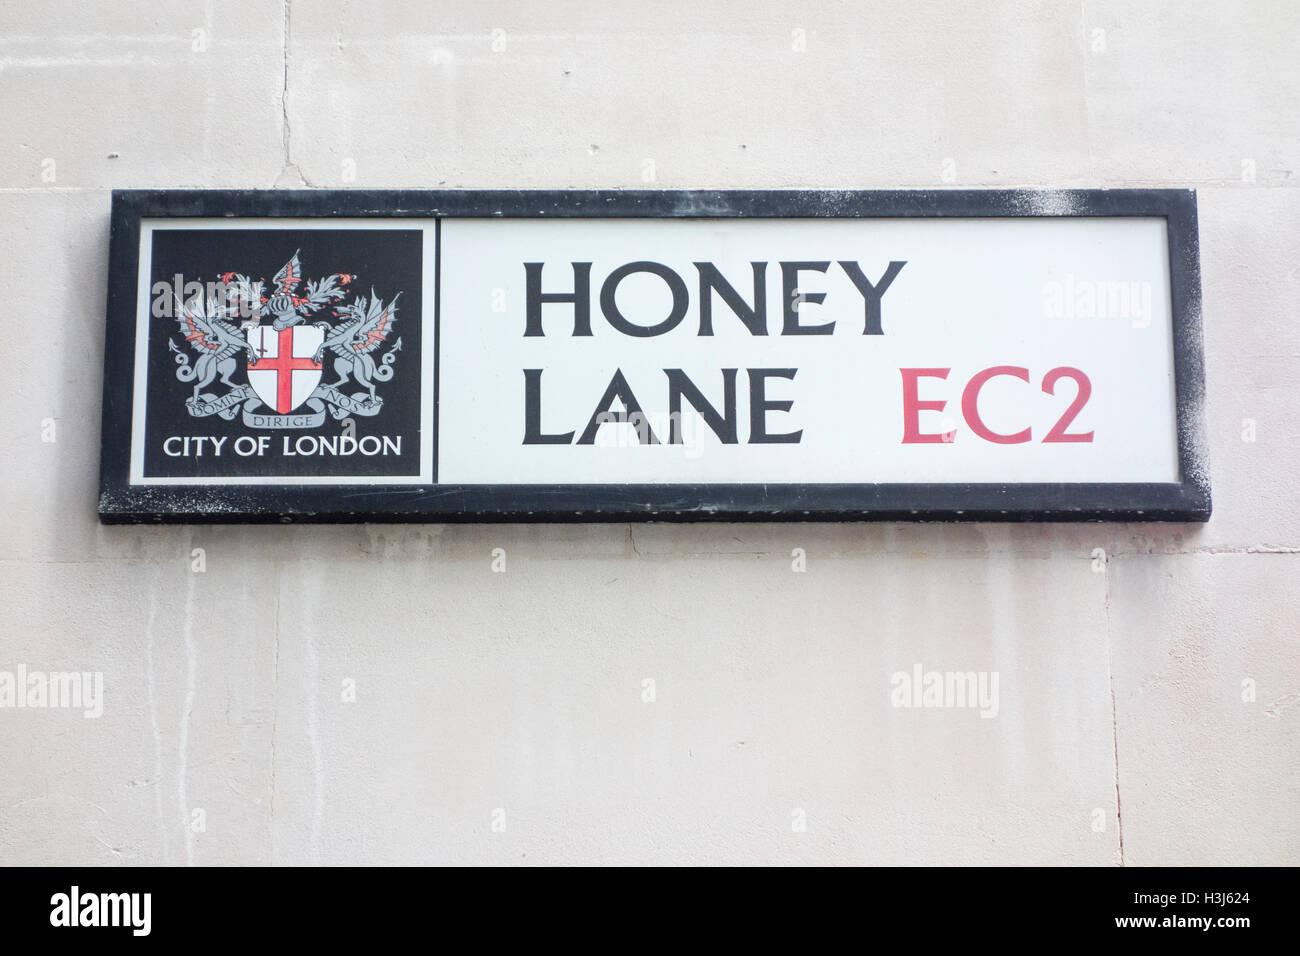 Honey Lane road sign, City of London, UK - Stock Image